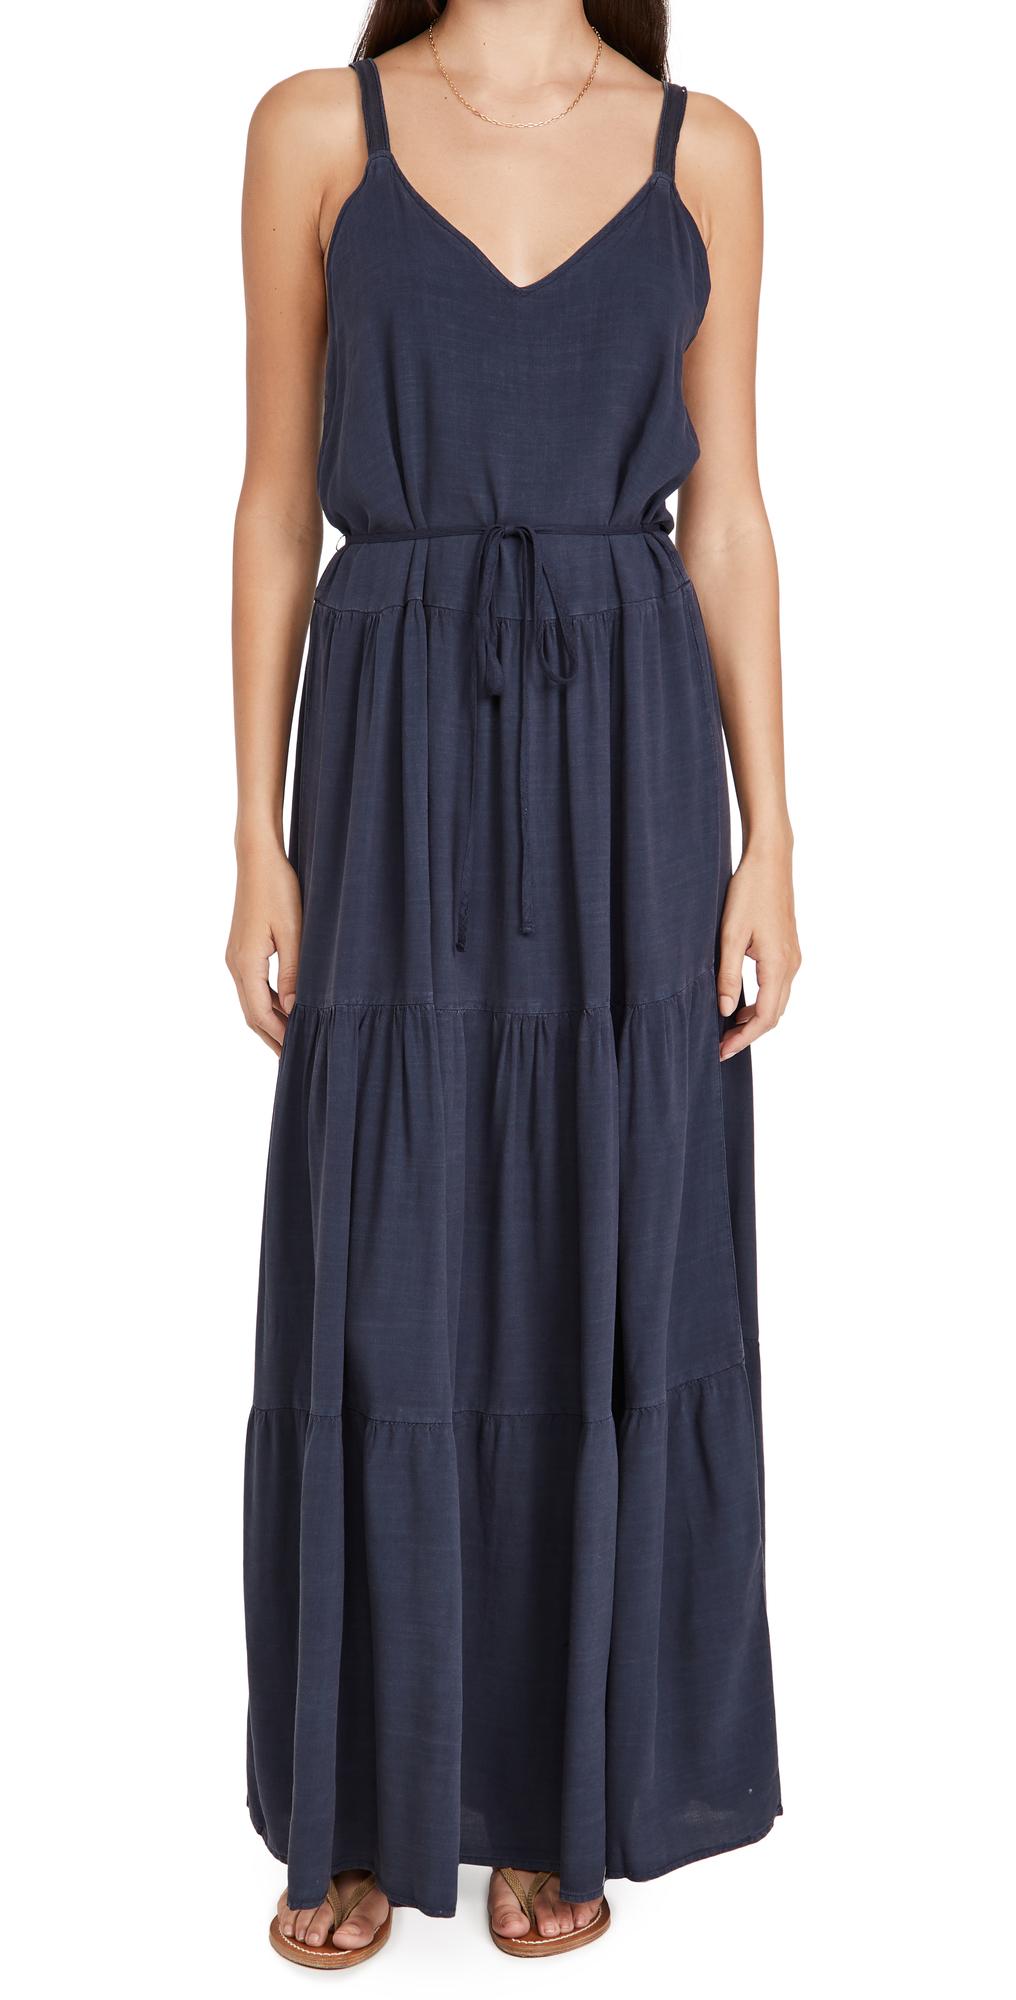 Splendid Wynona Dress